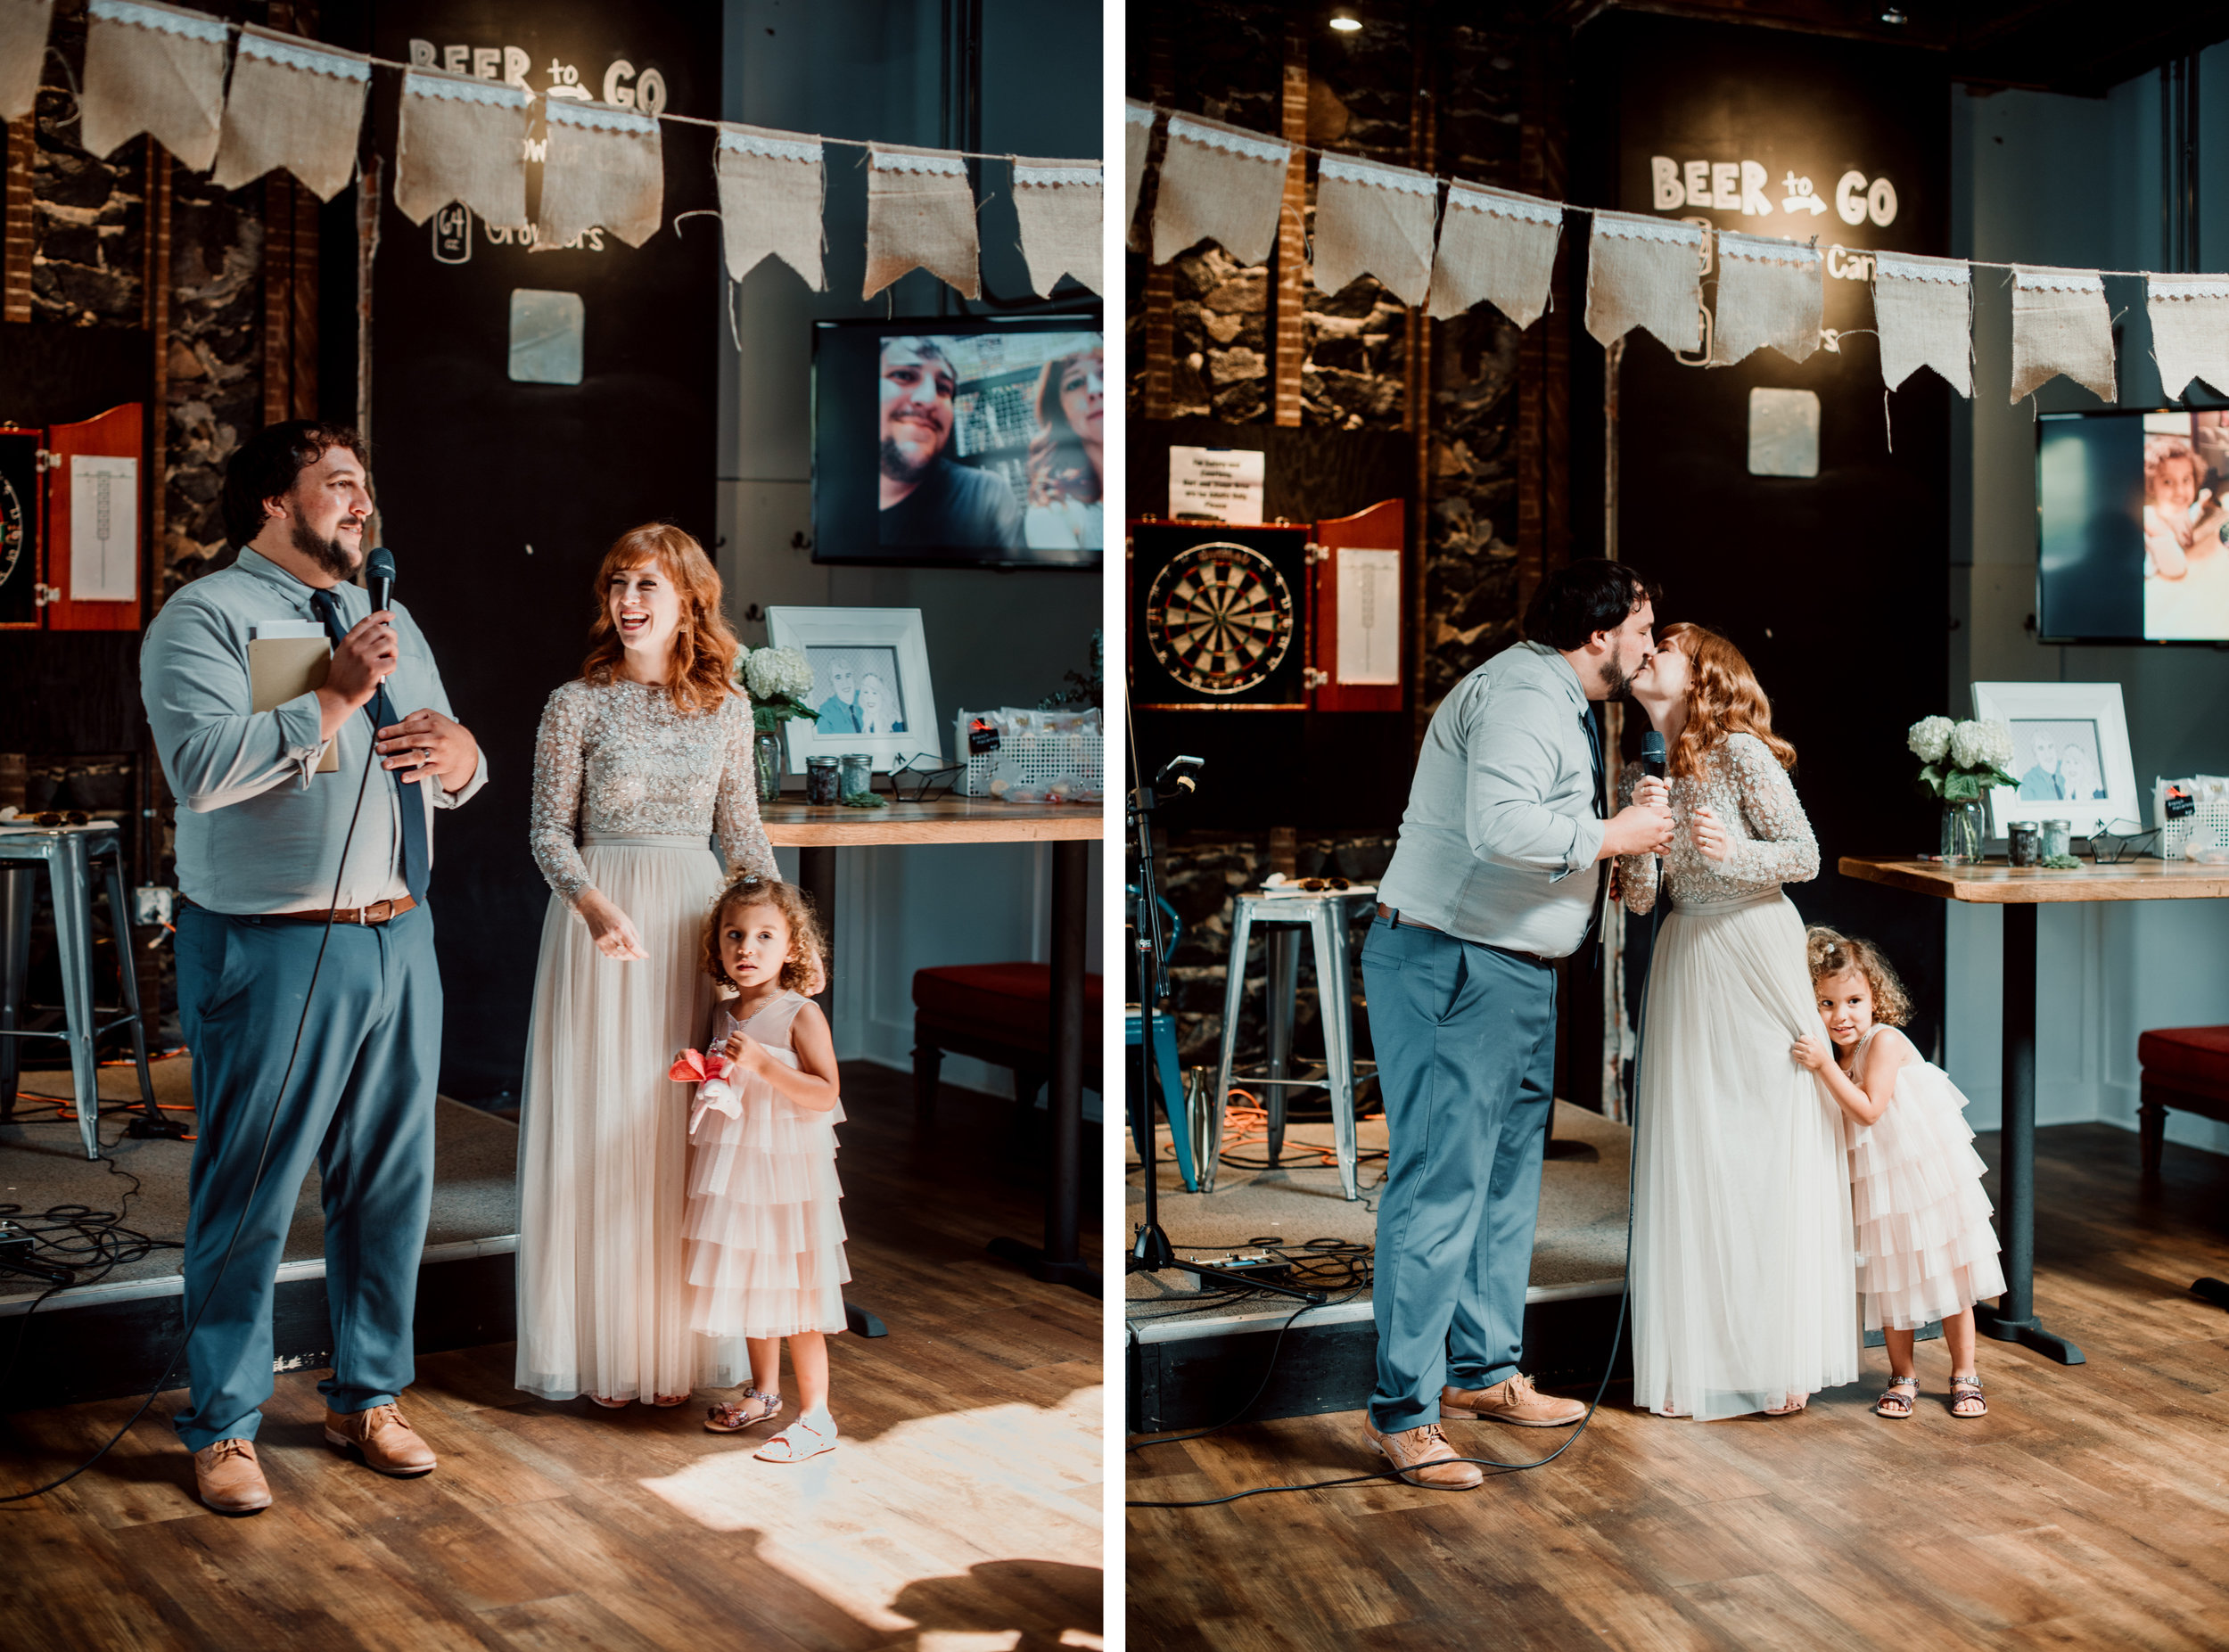 Philadelphia-wedding-photographer-la-cabra-brewery-diy-Peaberry-Photography-036.jpg